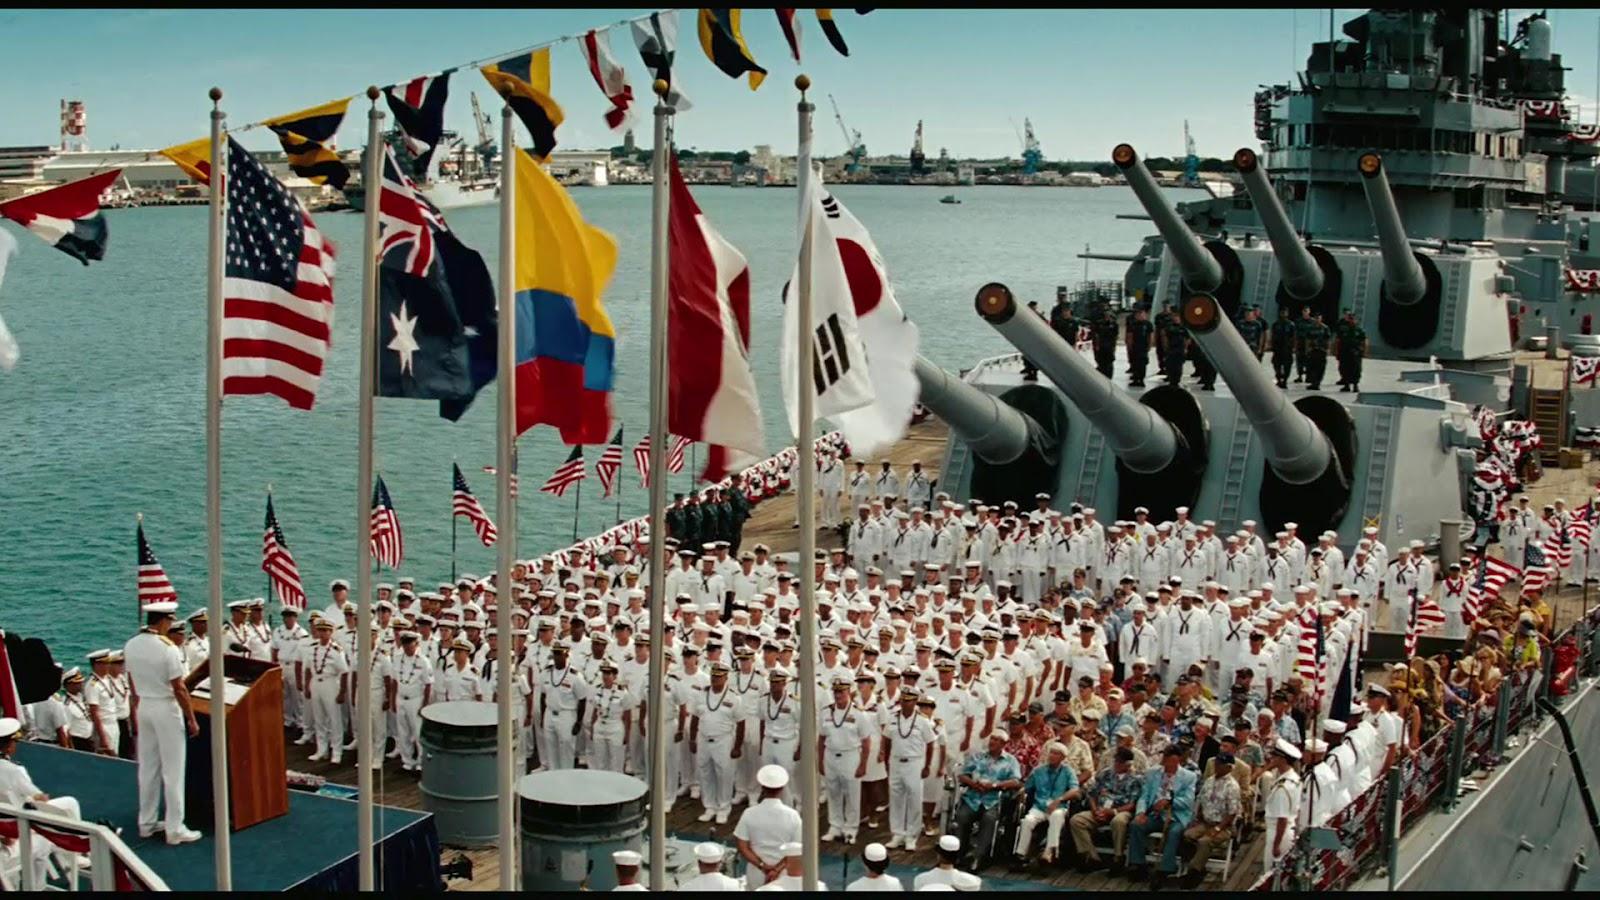 http://4.bp.blogspot.com/-FNjjn-Xszgc/UBHpjyqcDnI/AAAAAAAACfY/aEMvJx7ddHY/s1600/Battleship-033.jpg